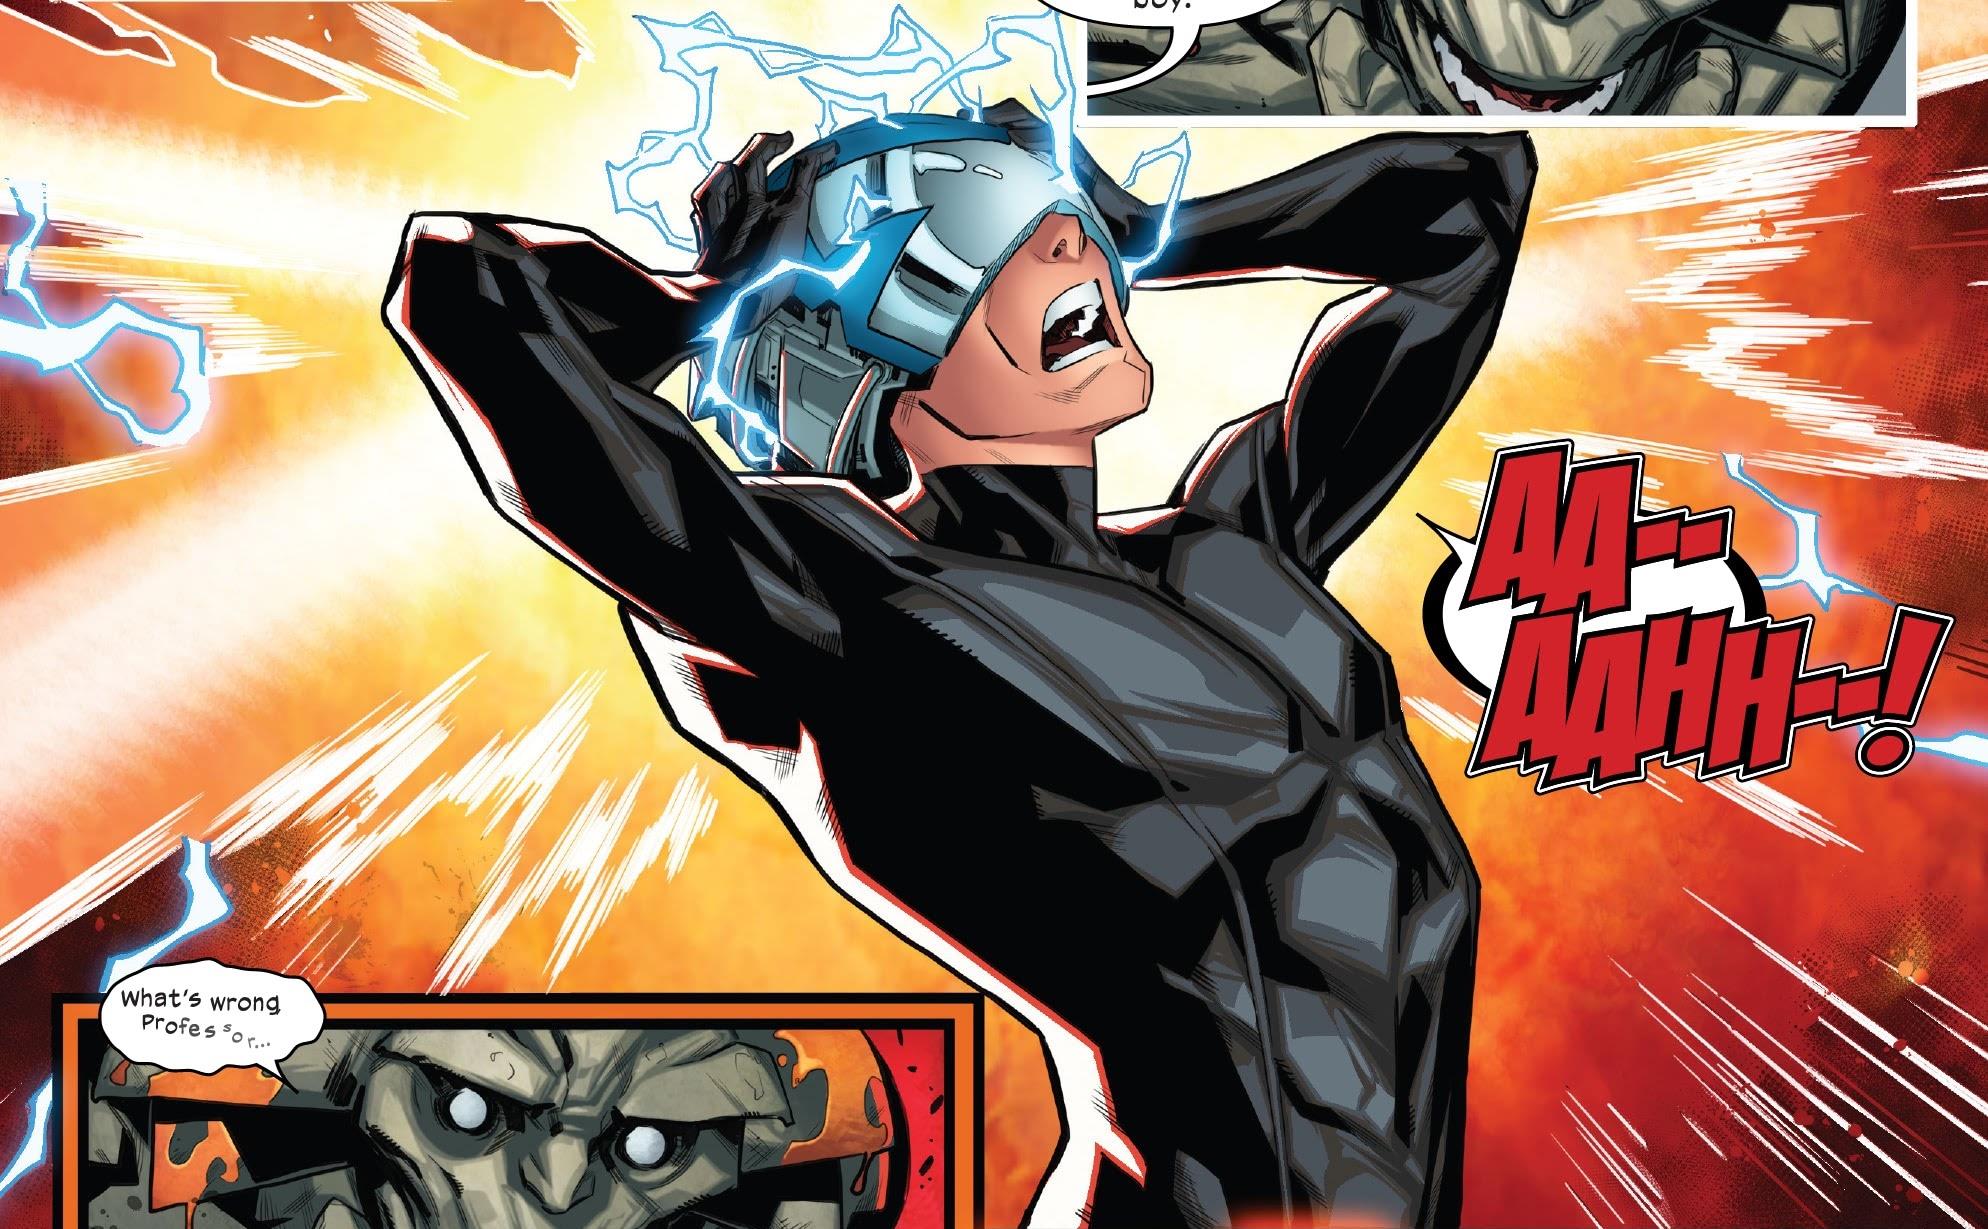 Professor X screams as feedback from Otherworld blazes through the Cerebro network in X-Factor #4, Marvel Comics (2020).